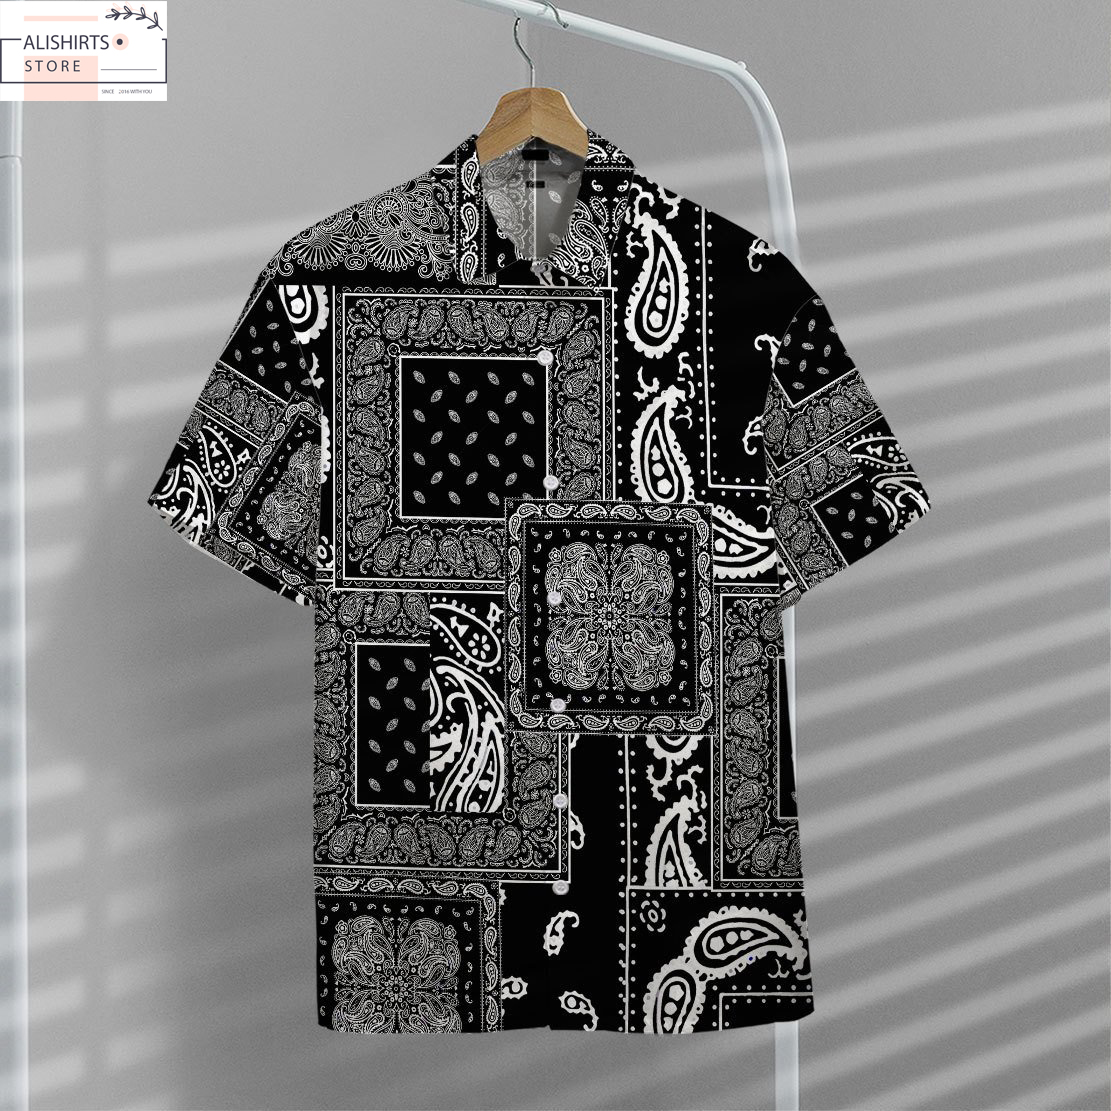 3D BLACK MULTIPLE PAISLEY BANDANAS HAWAII SHIRT